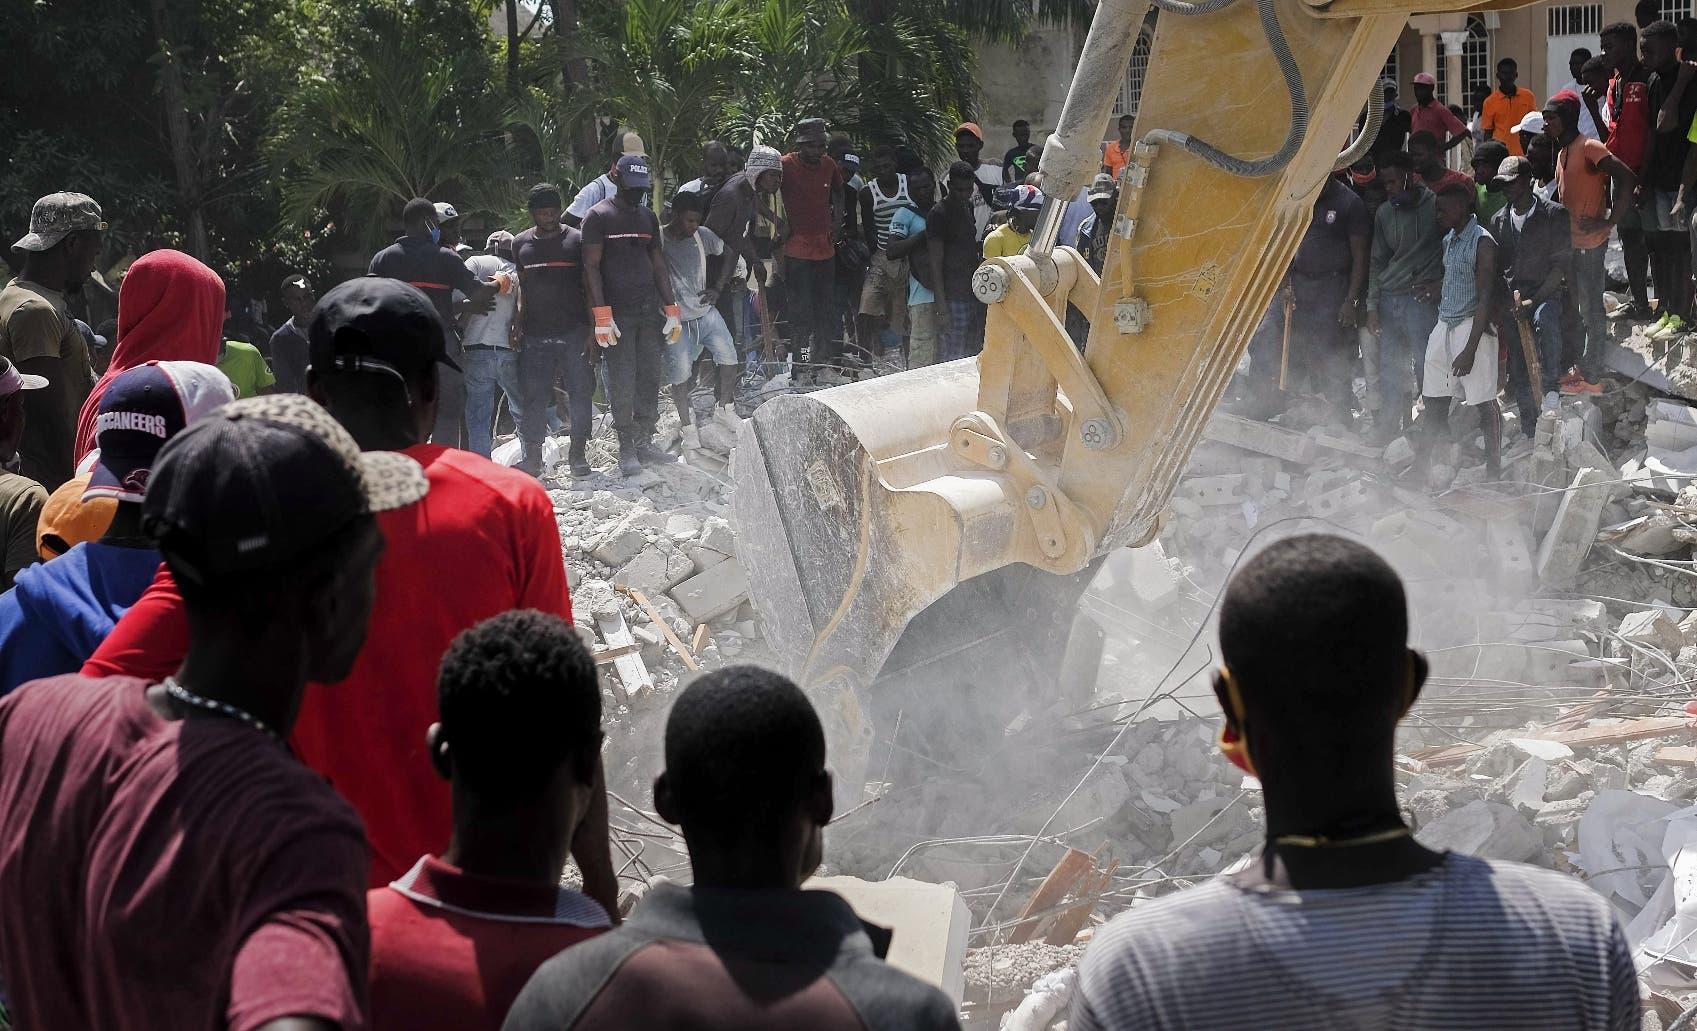 Terremoto de Haití se suma a gran cadena de infortunios